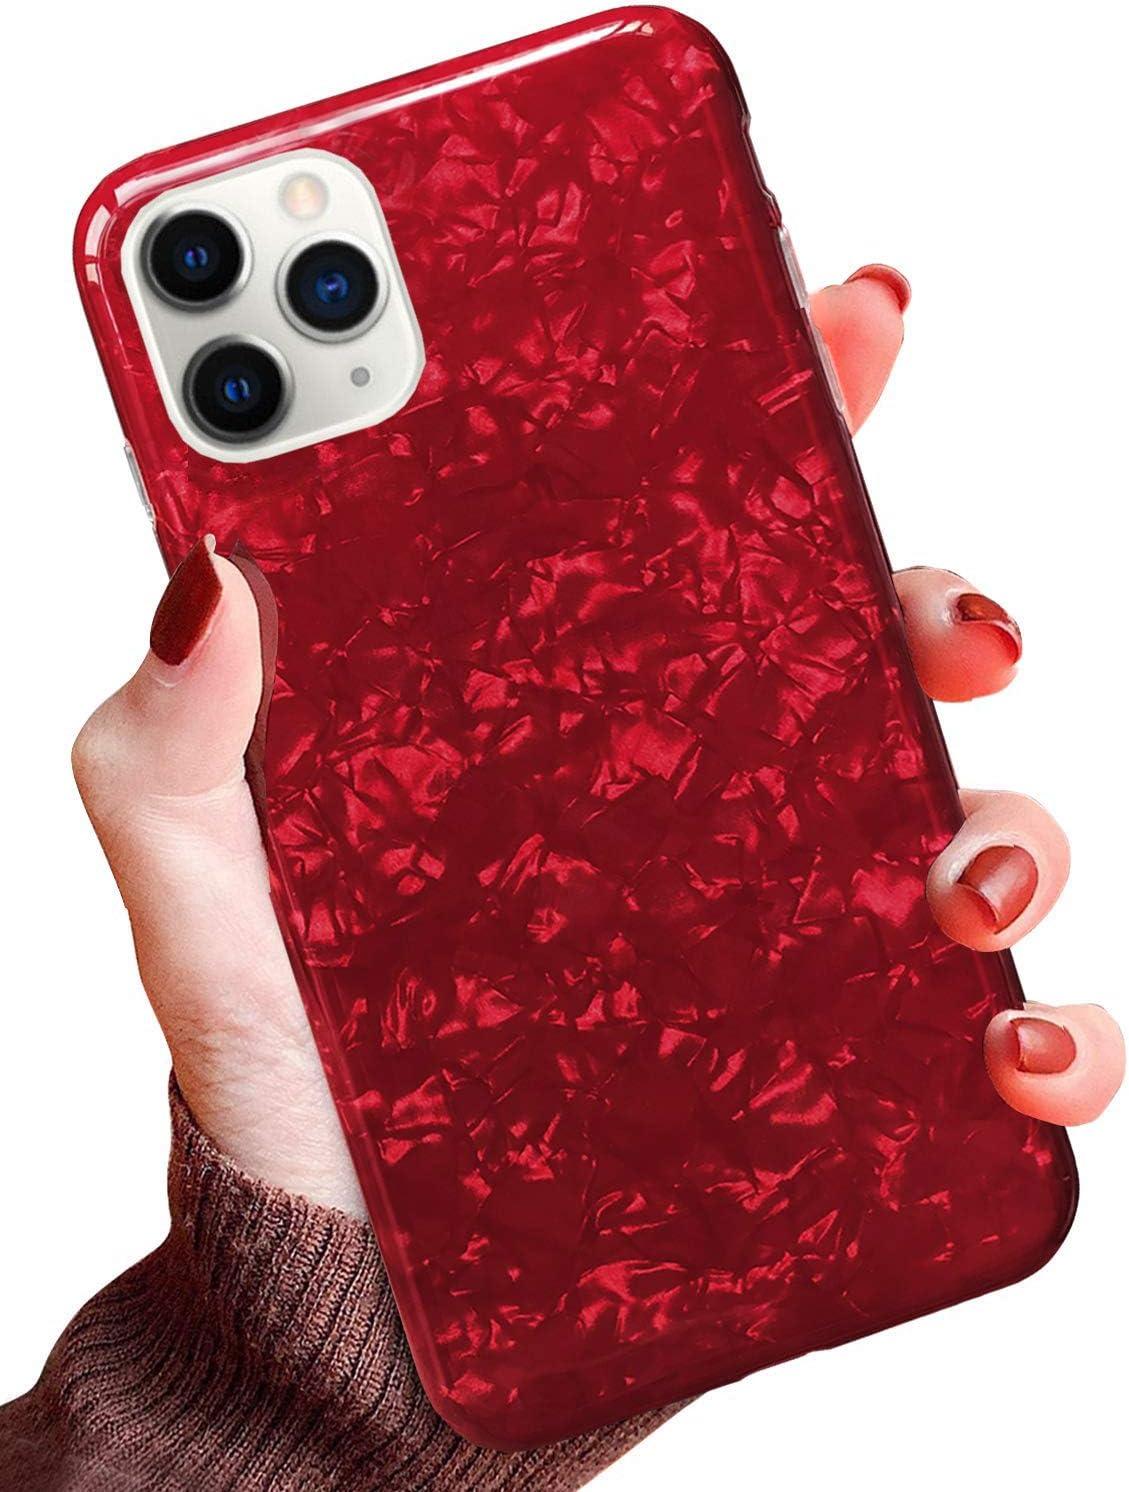 QPOLLY Compatible con iPhone 11 Pro Funda Glitter Bling Brillante Enchapado Silicona TPU Ultra Delgado Transparente Gel Suave Cubierta Protectora Case Cover para iPhone 11 Pro,Rosa Blanco